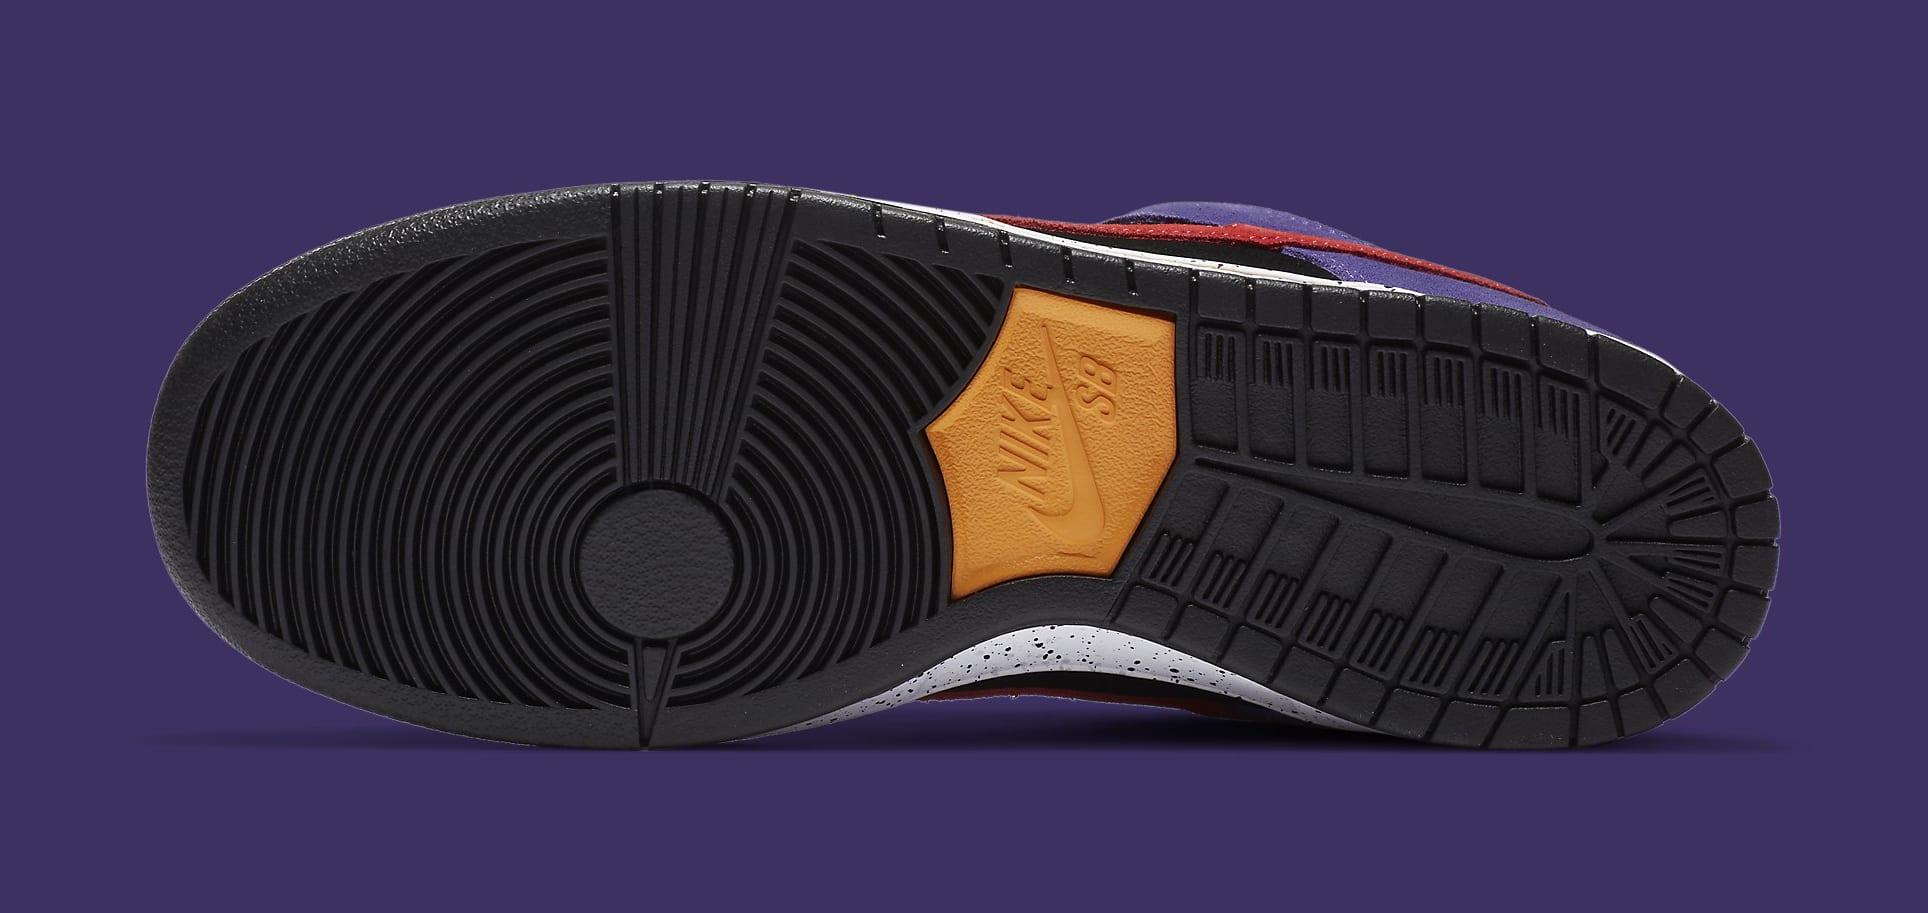 Nike SB Dunk Low 'ACG' BQ6817-008 Outsole